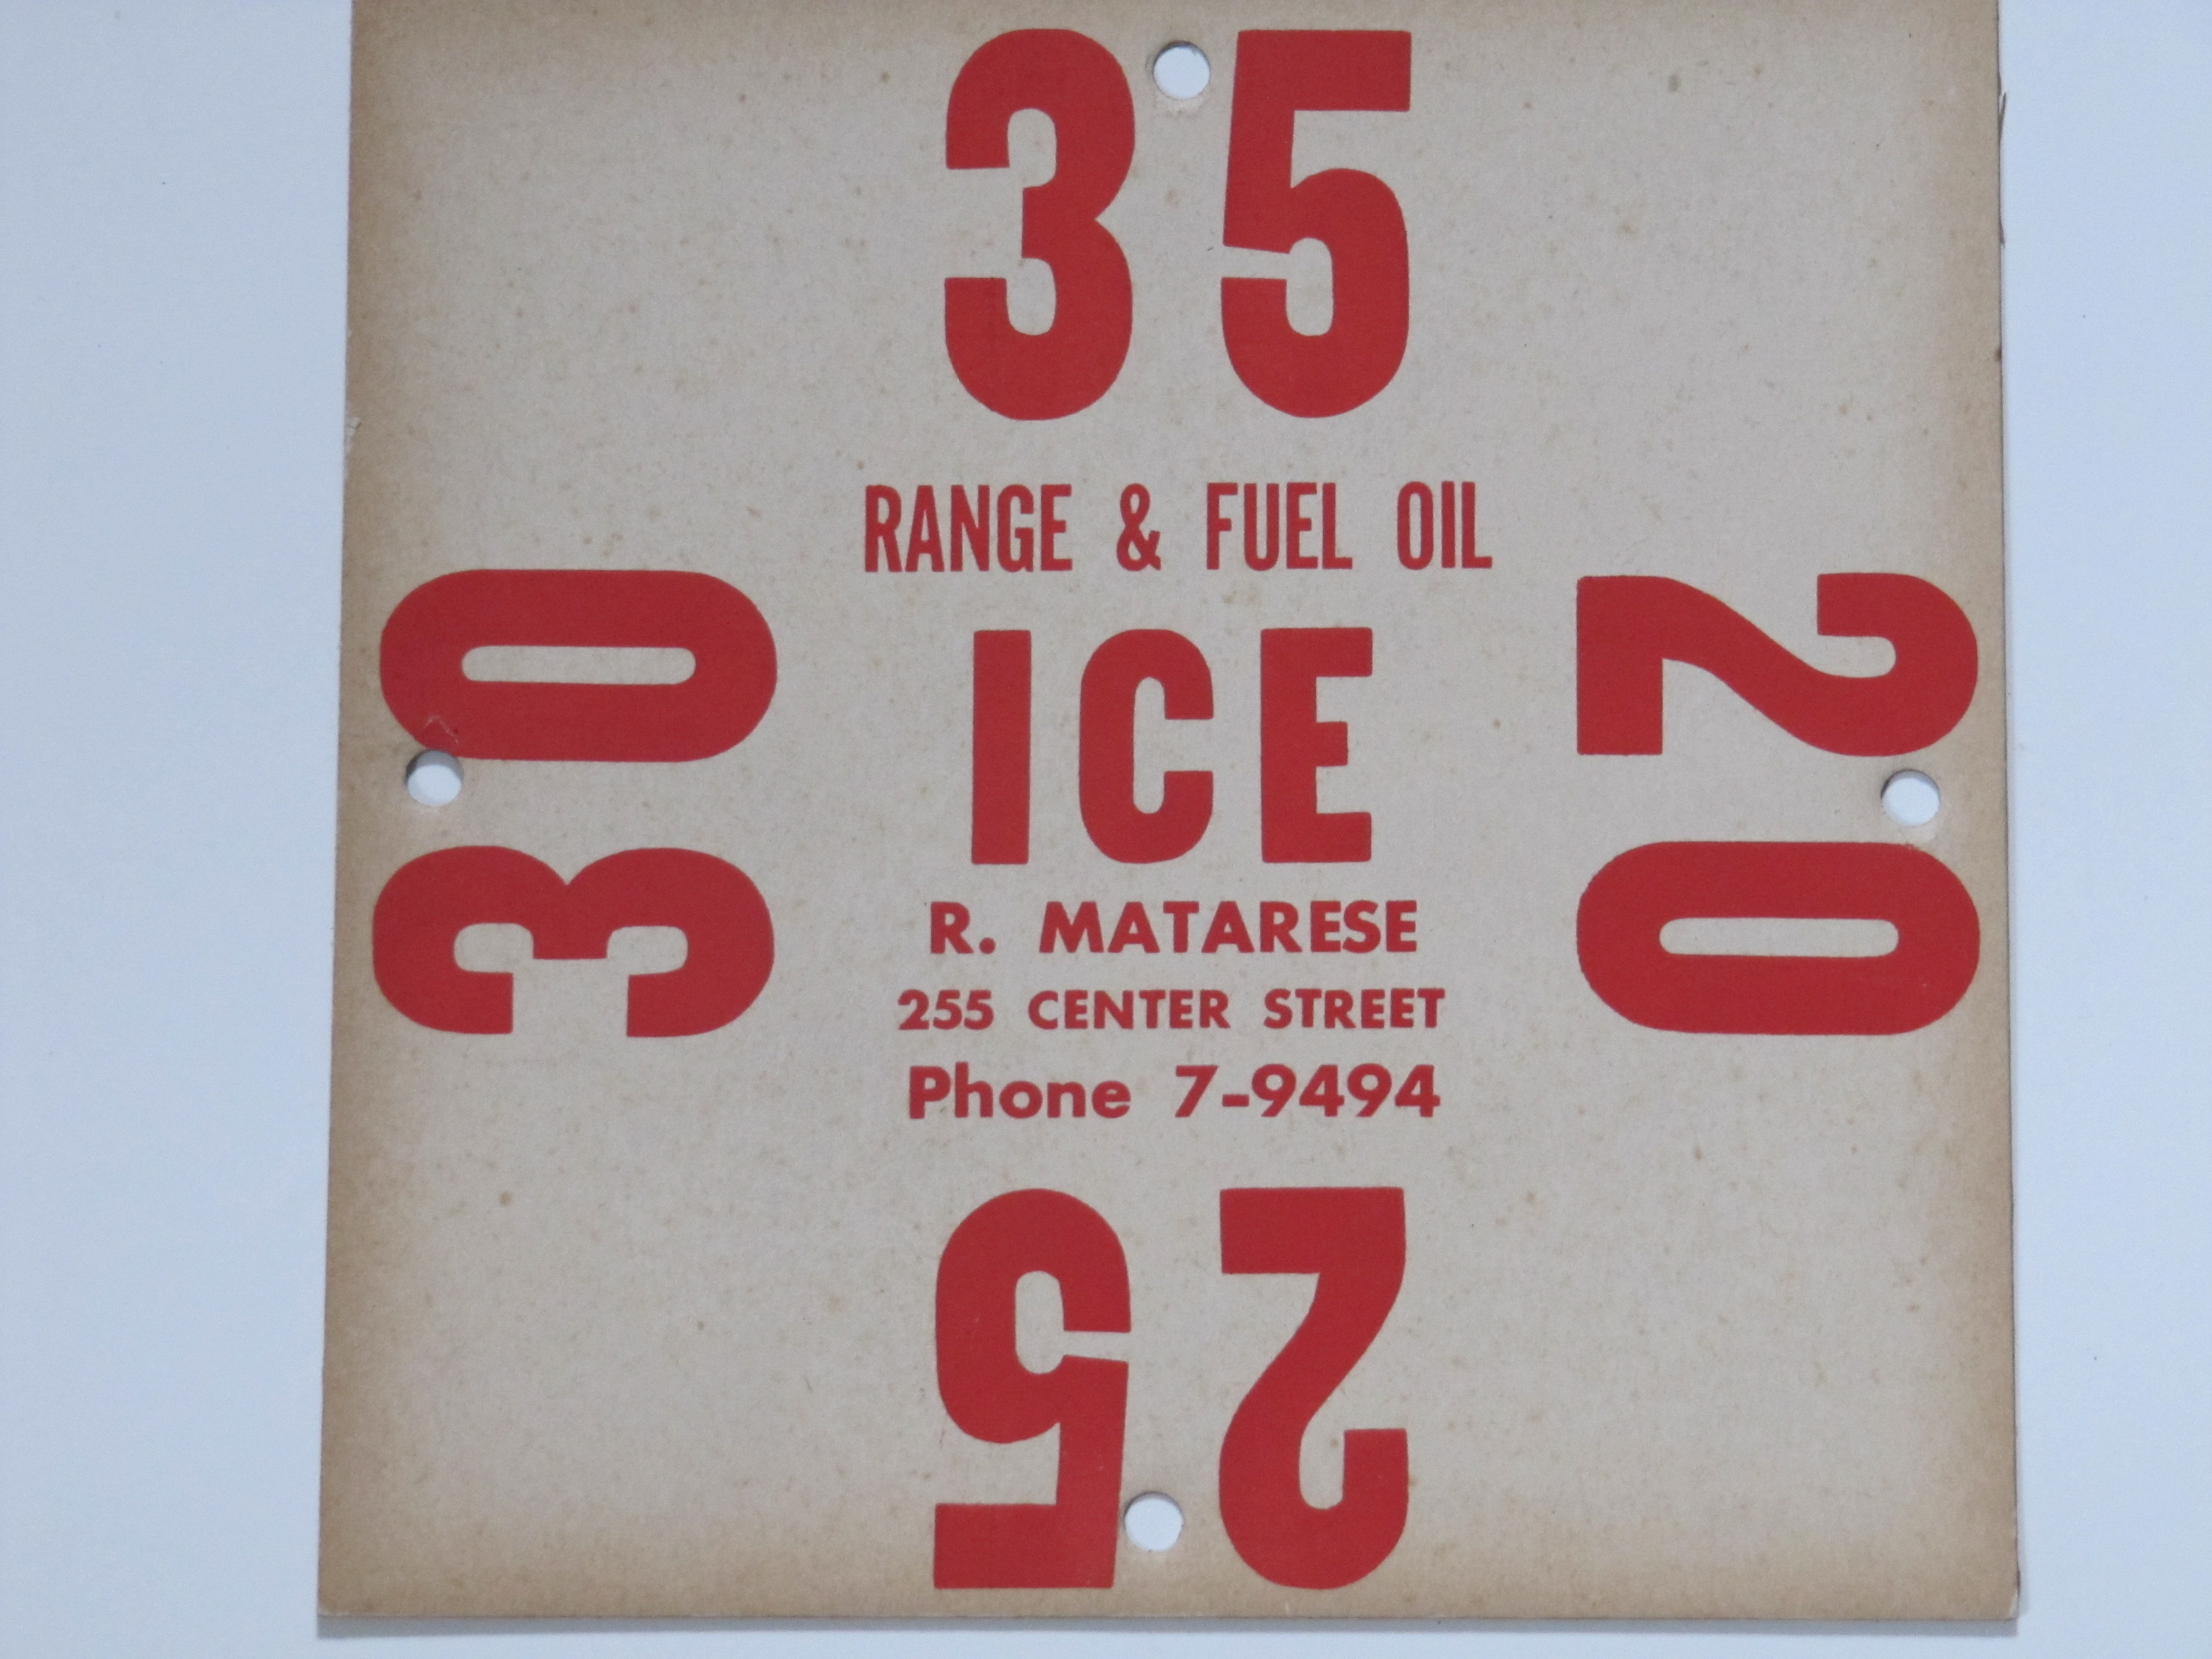 R.Matarese Ice